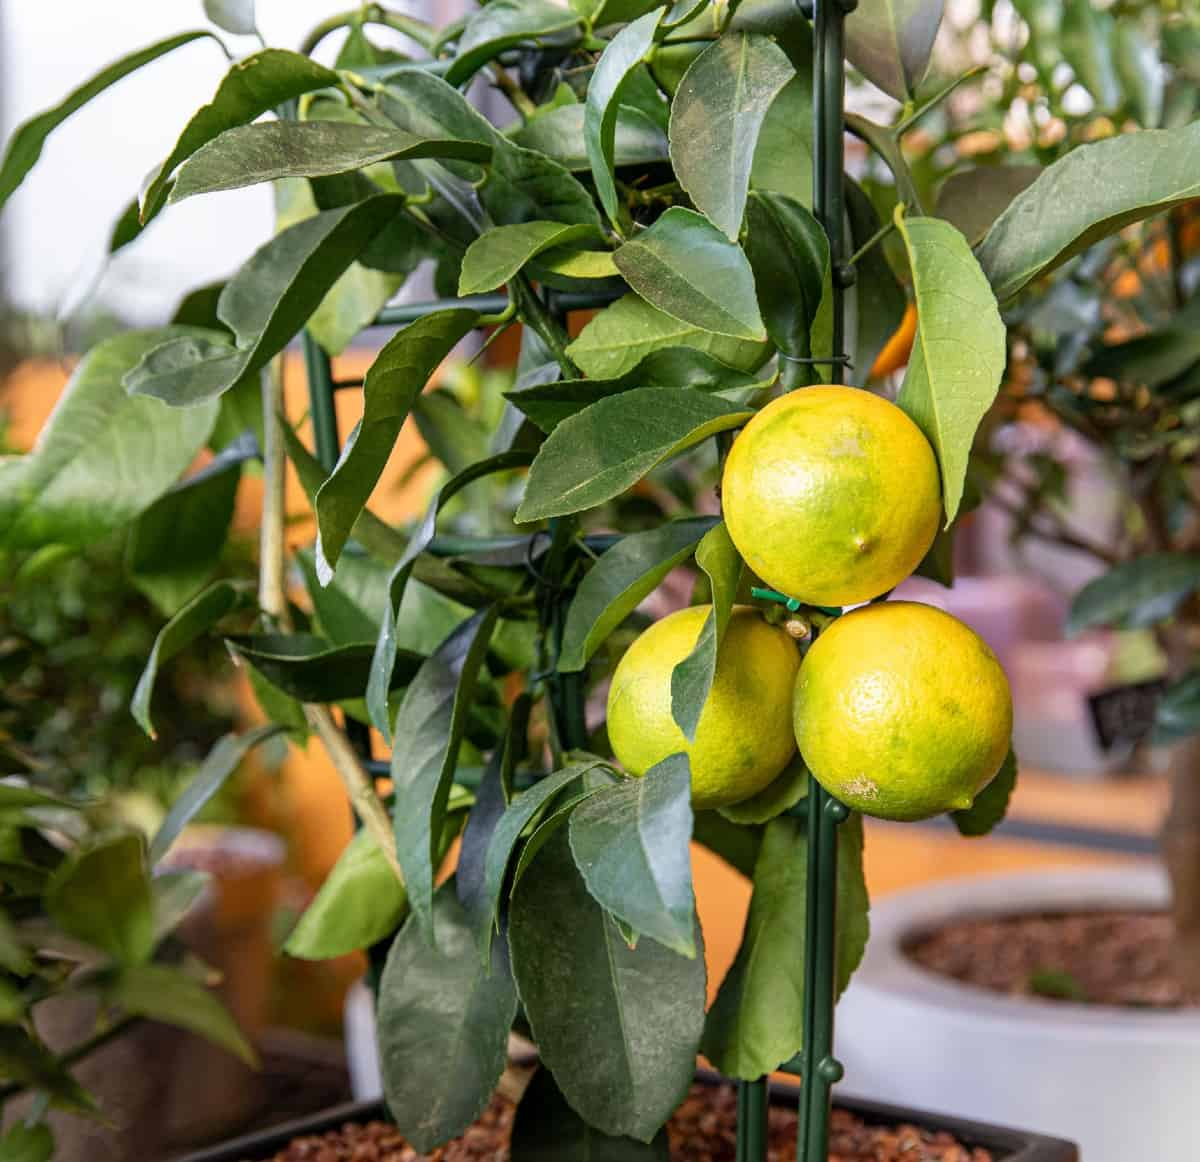 Grow a dwarf lemon tree inside for fruit all year.